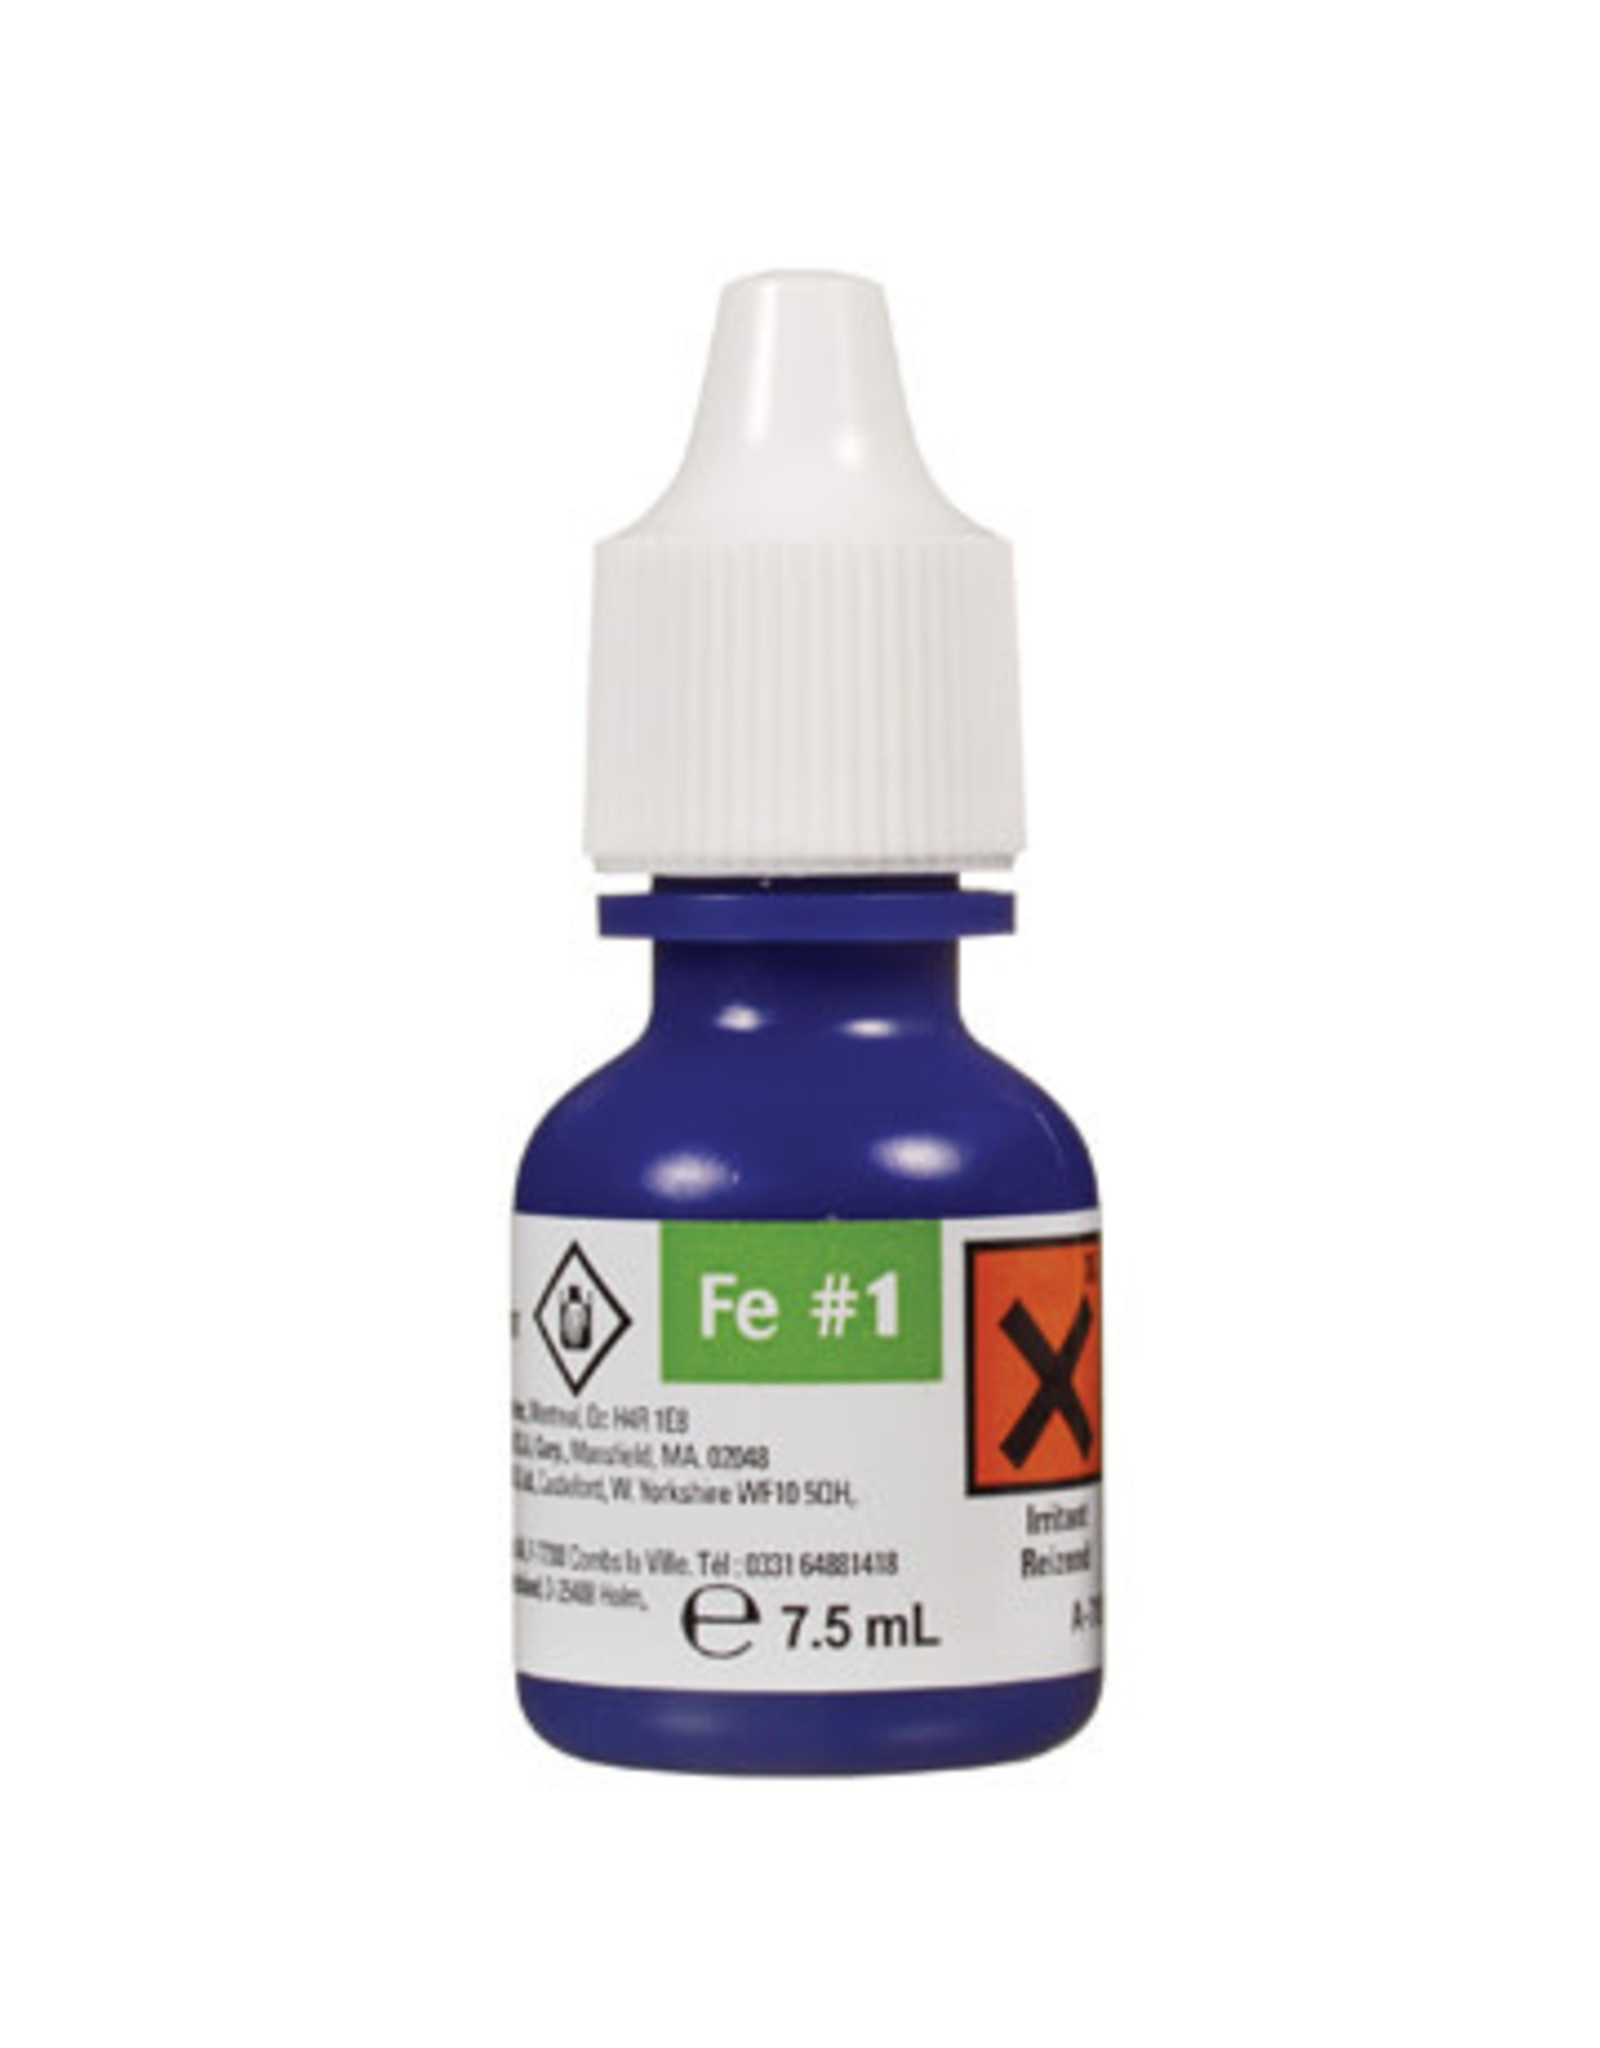 Nutrafin Nutrafin Iron reagent #1 refill, 7.5 mL (0.2 fl oz)